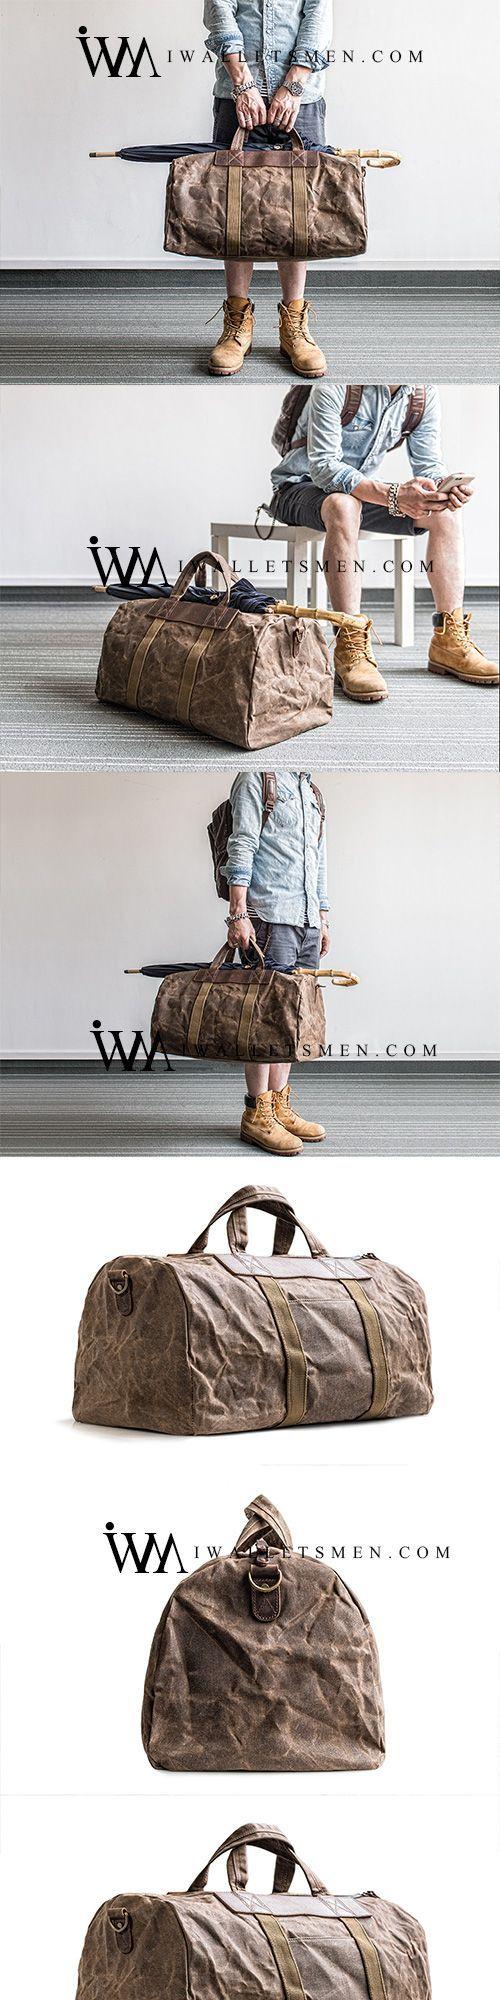 CANVAS MENS COOL WEEKENDER BAG TRAVEL BAG DUFFLE BAGS OVERNIGHT BAG HOLDALL BAG FOR MEN #mensaccessoriesbags